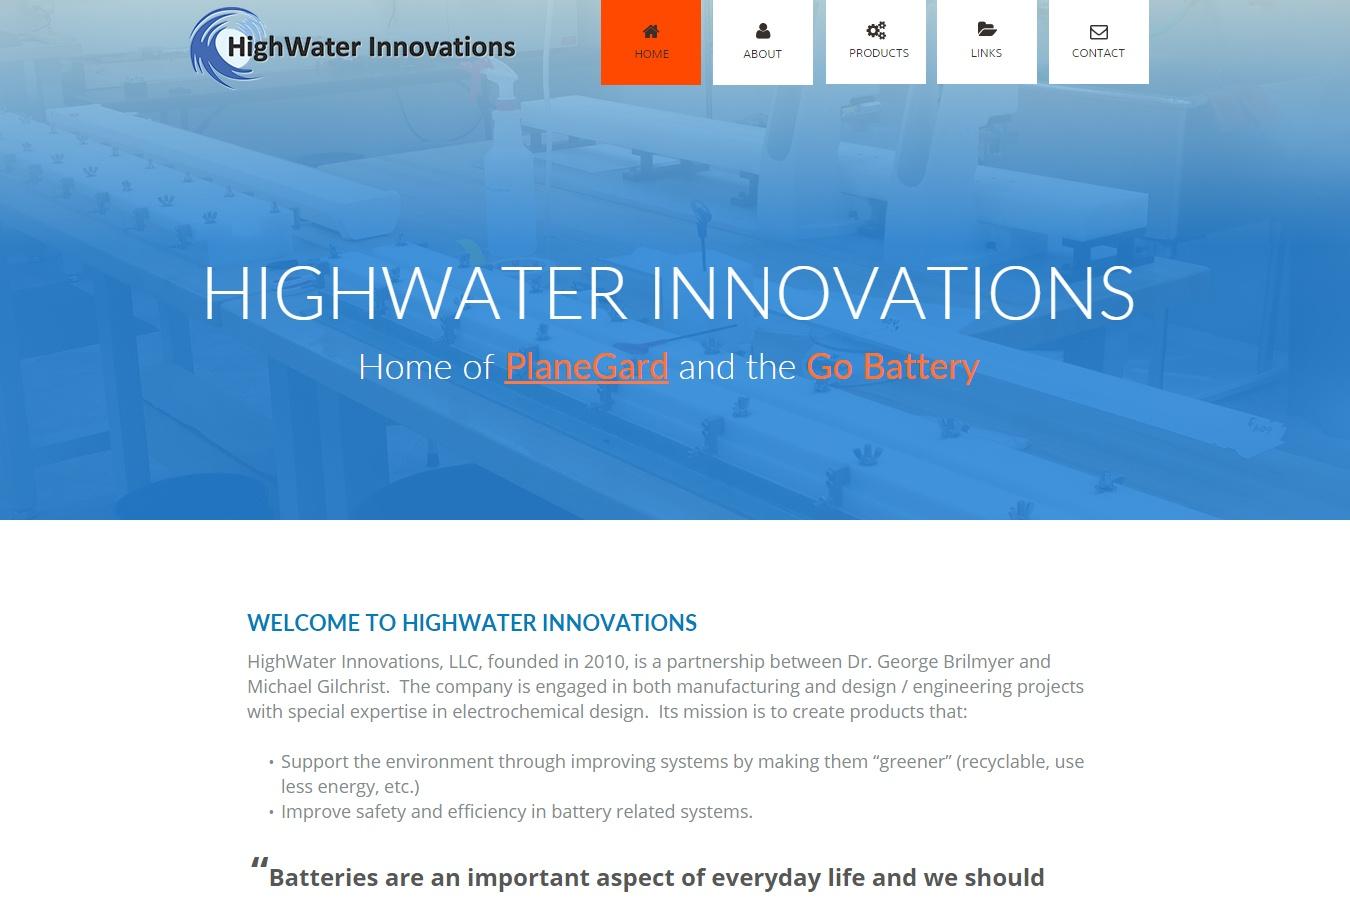 www.highwaterinnovations.com.jpg